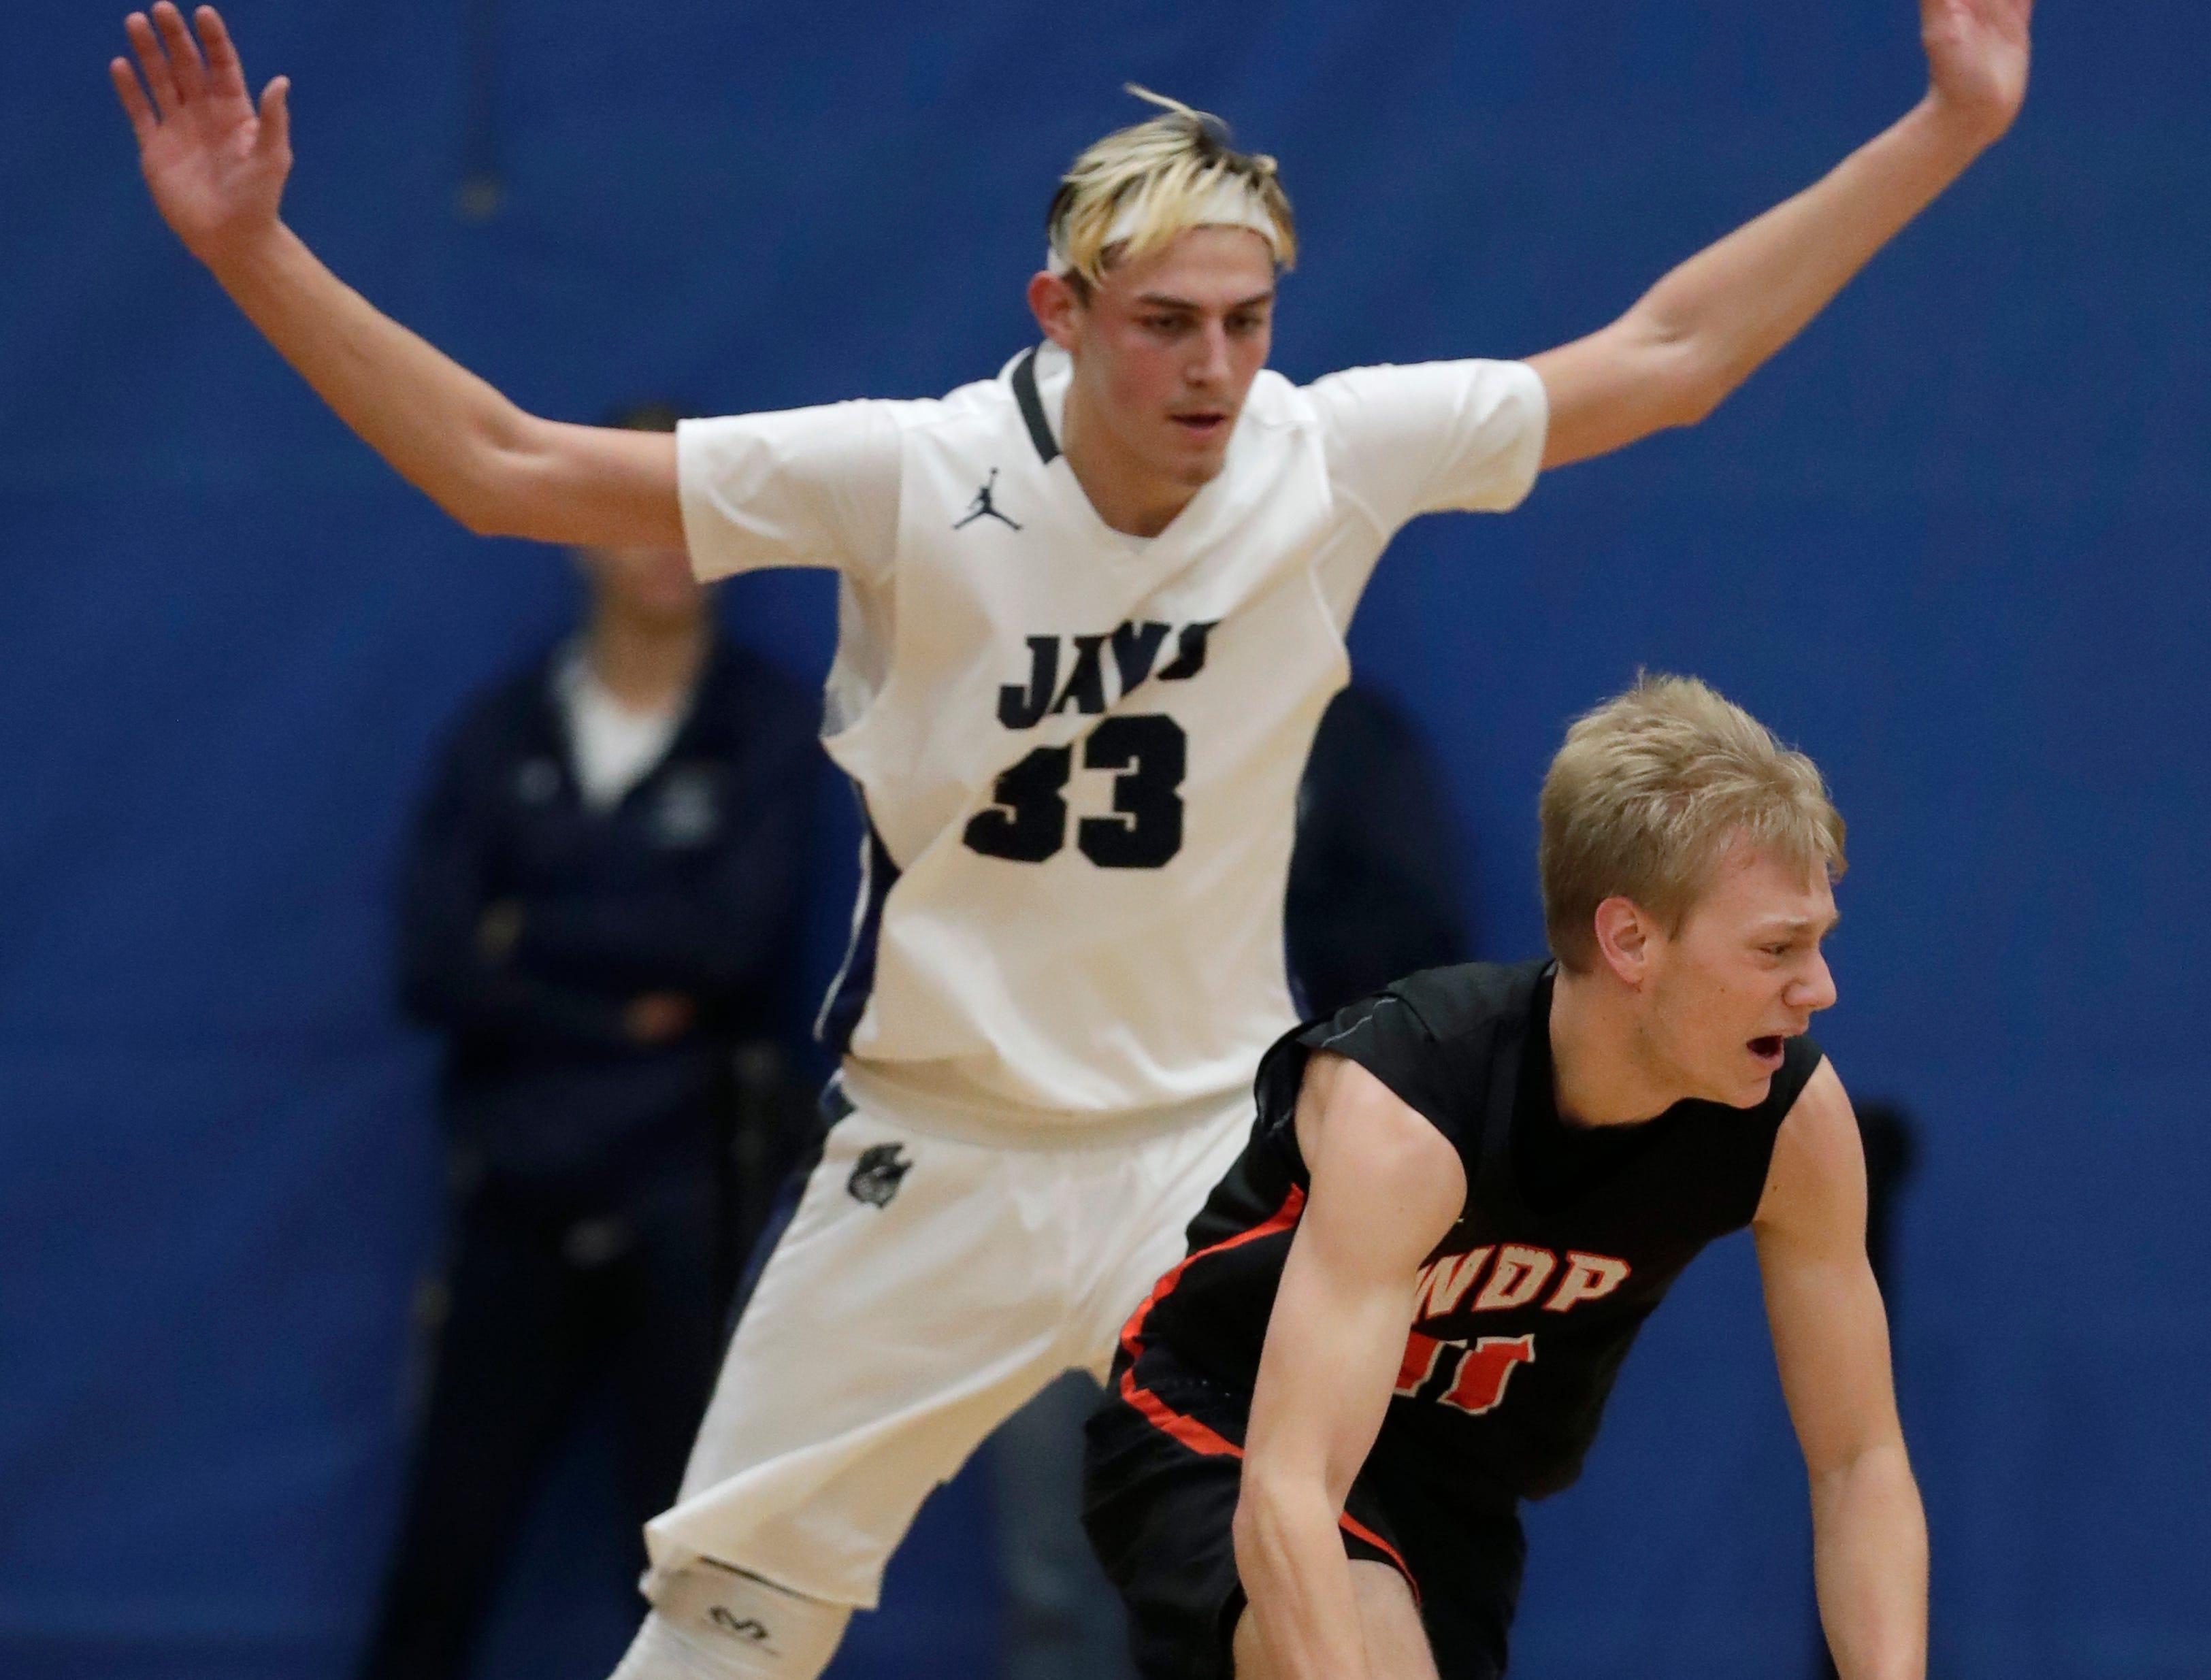 Menasha High School's Ben Romnek (33) defends against West De Pere High School's Brady Darrow (11) during their boys basketball game Tuesday, December 11, 2018, in Menasha, Wis. Dan Powers/USA TODAY NETWORK-Wisconsin